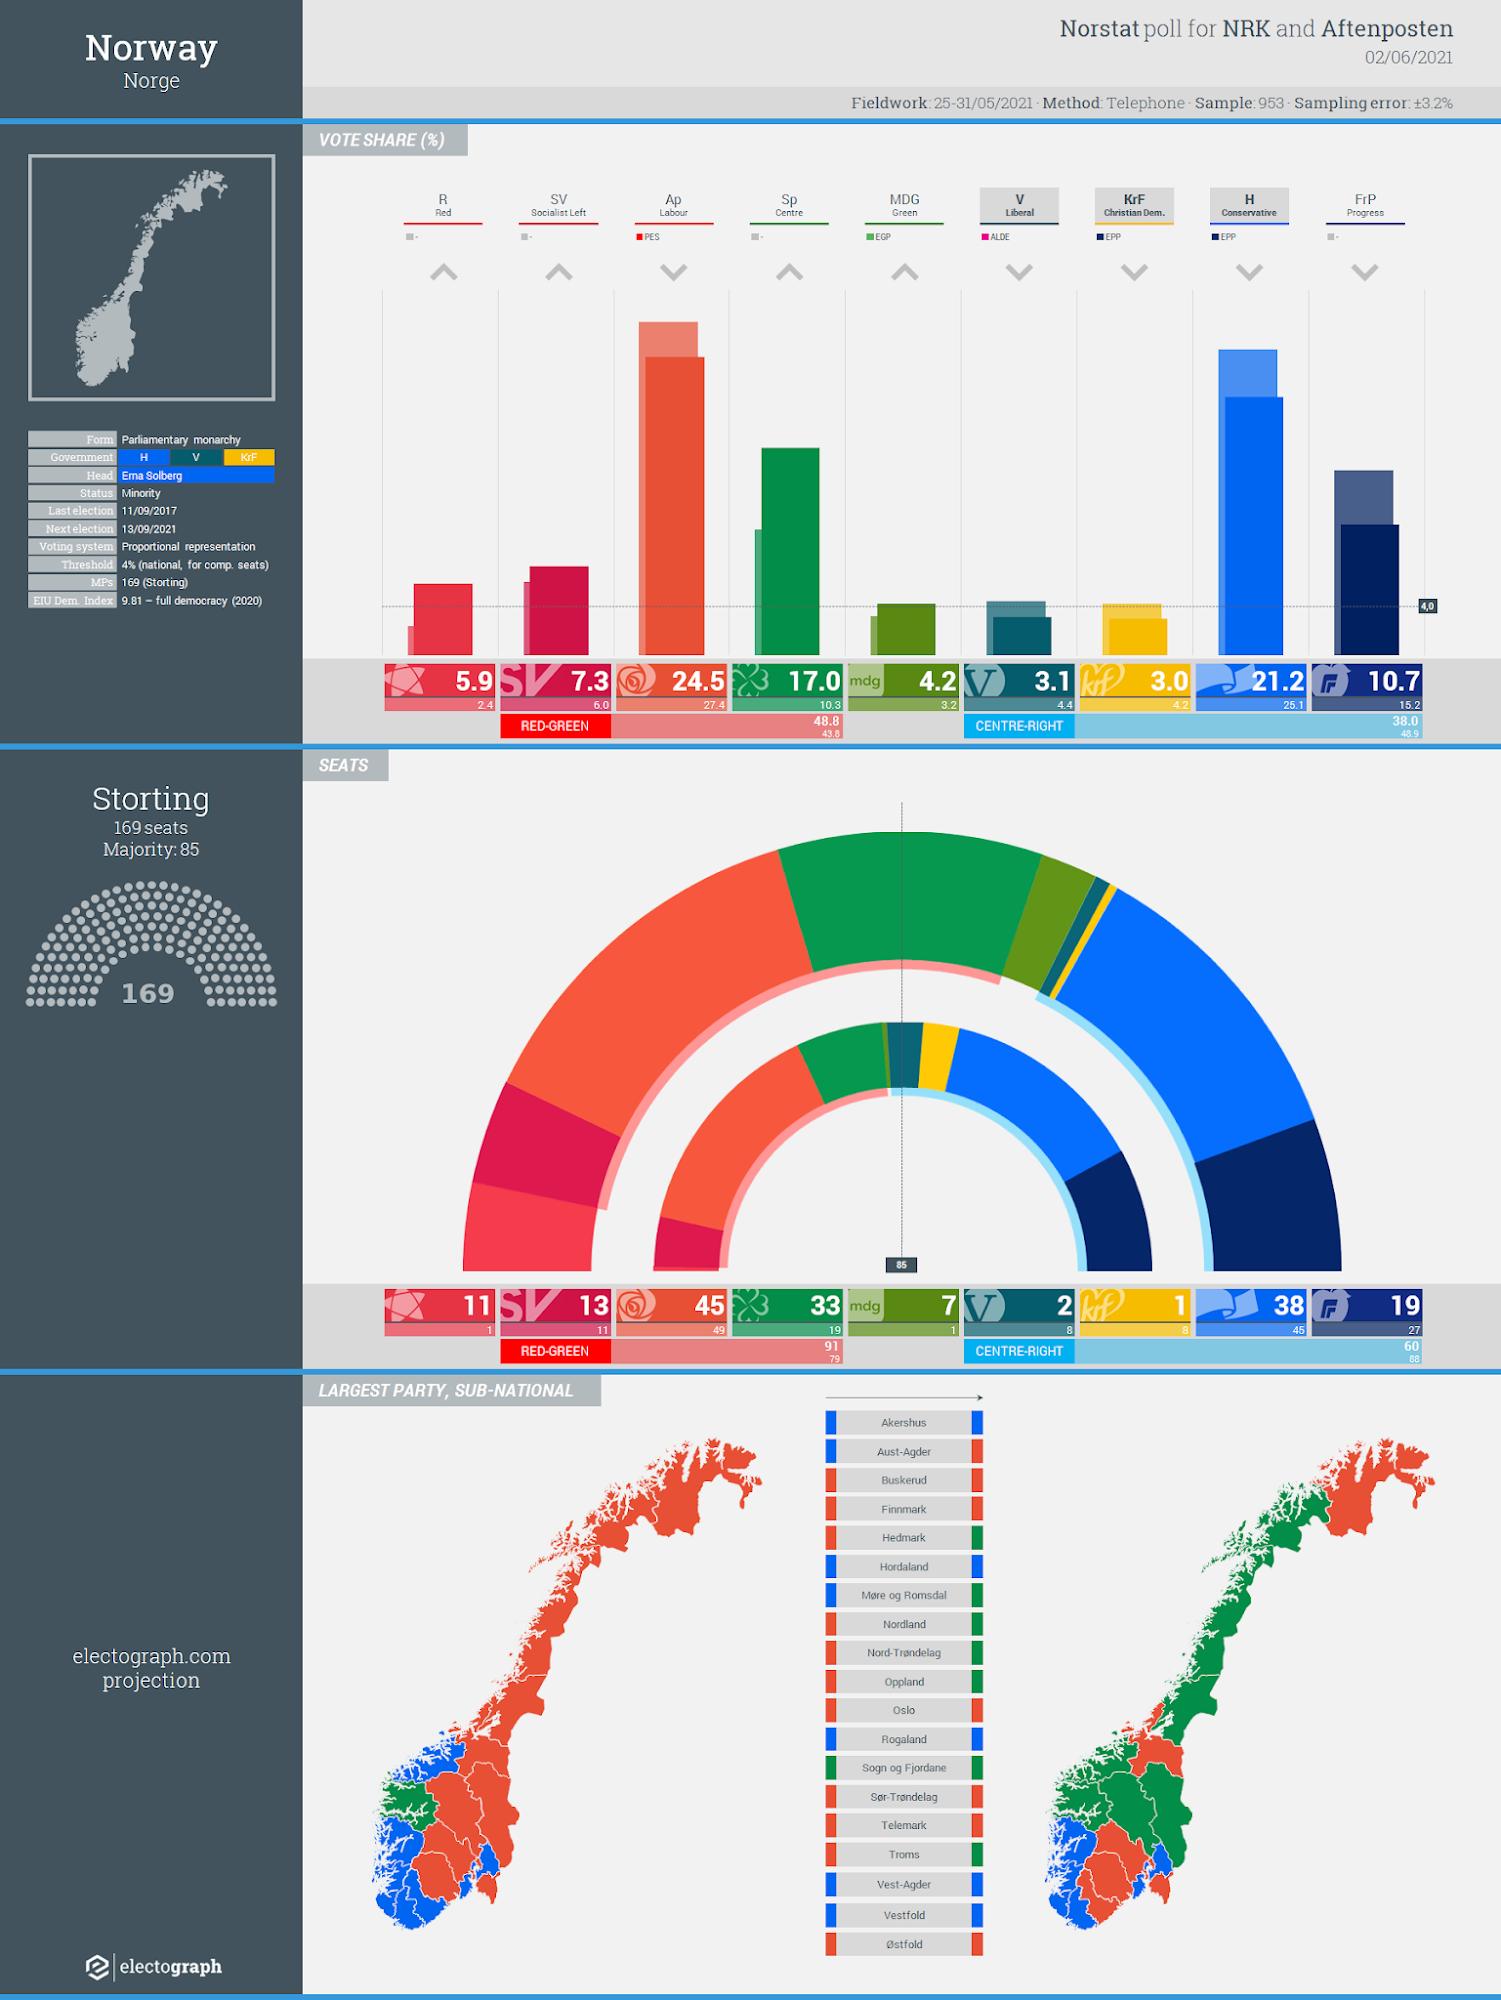 NORWAY: Norstat poll chart for NRK and Aftenposten, 2 June 2021